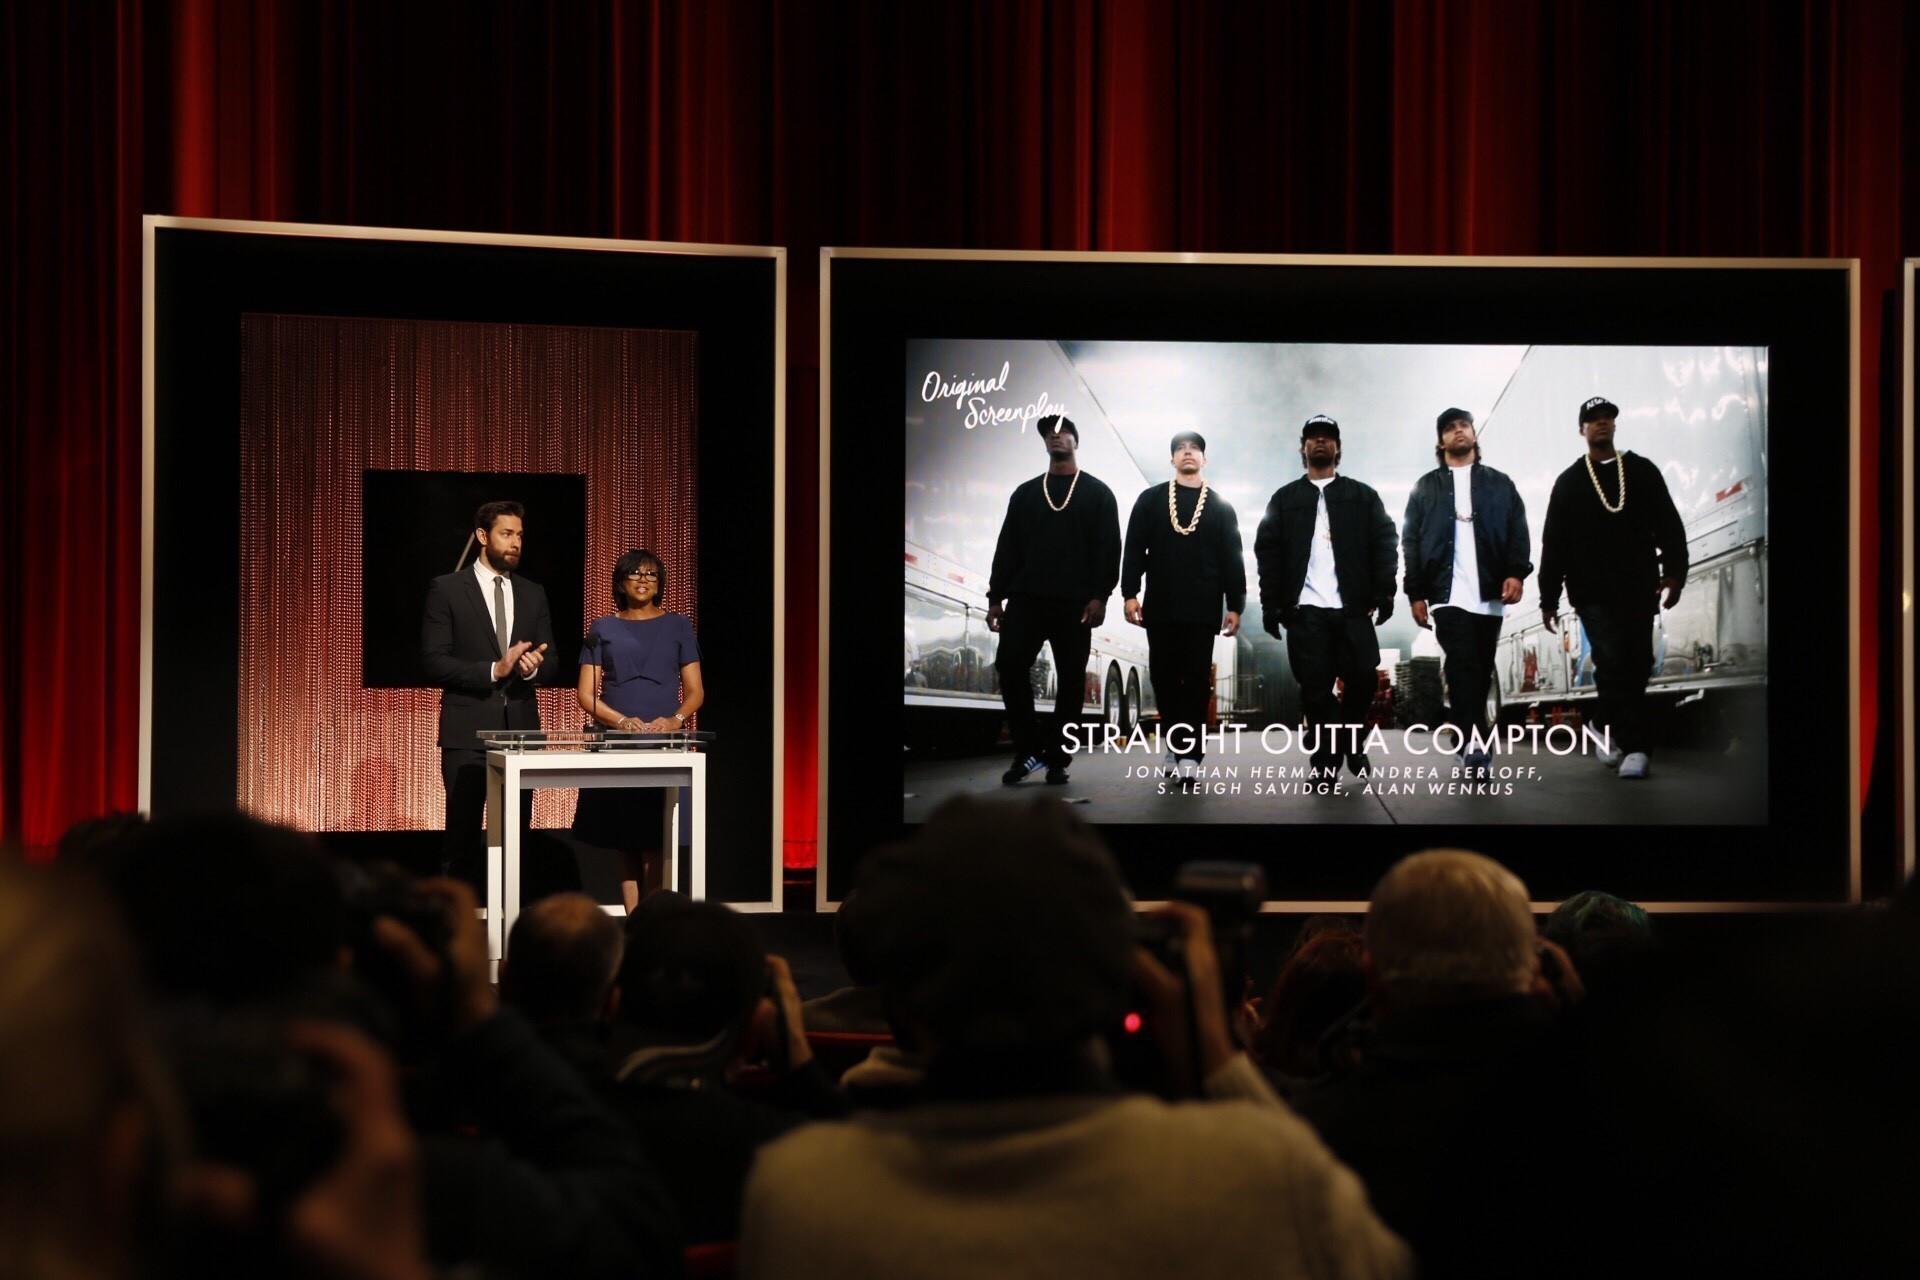 #OscarsSoWhite creator on Oscar noms: 'Don't tell me that ...